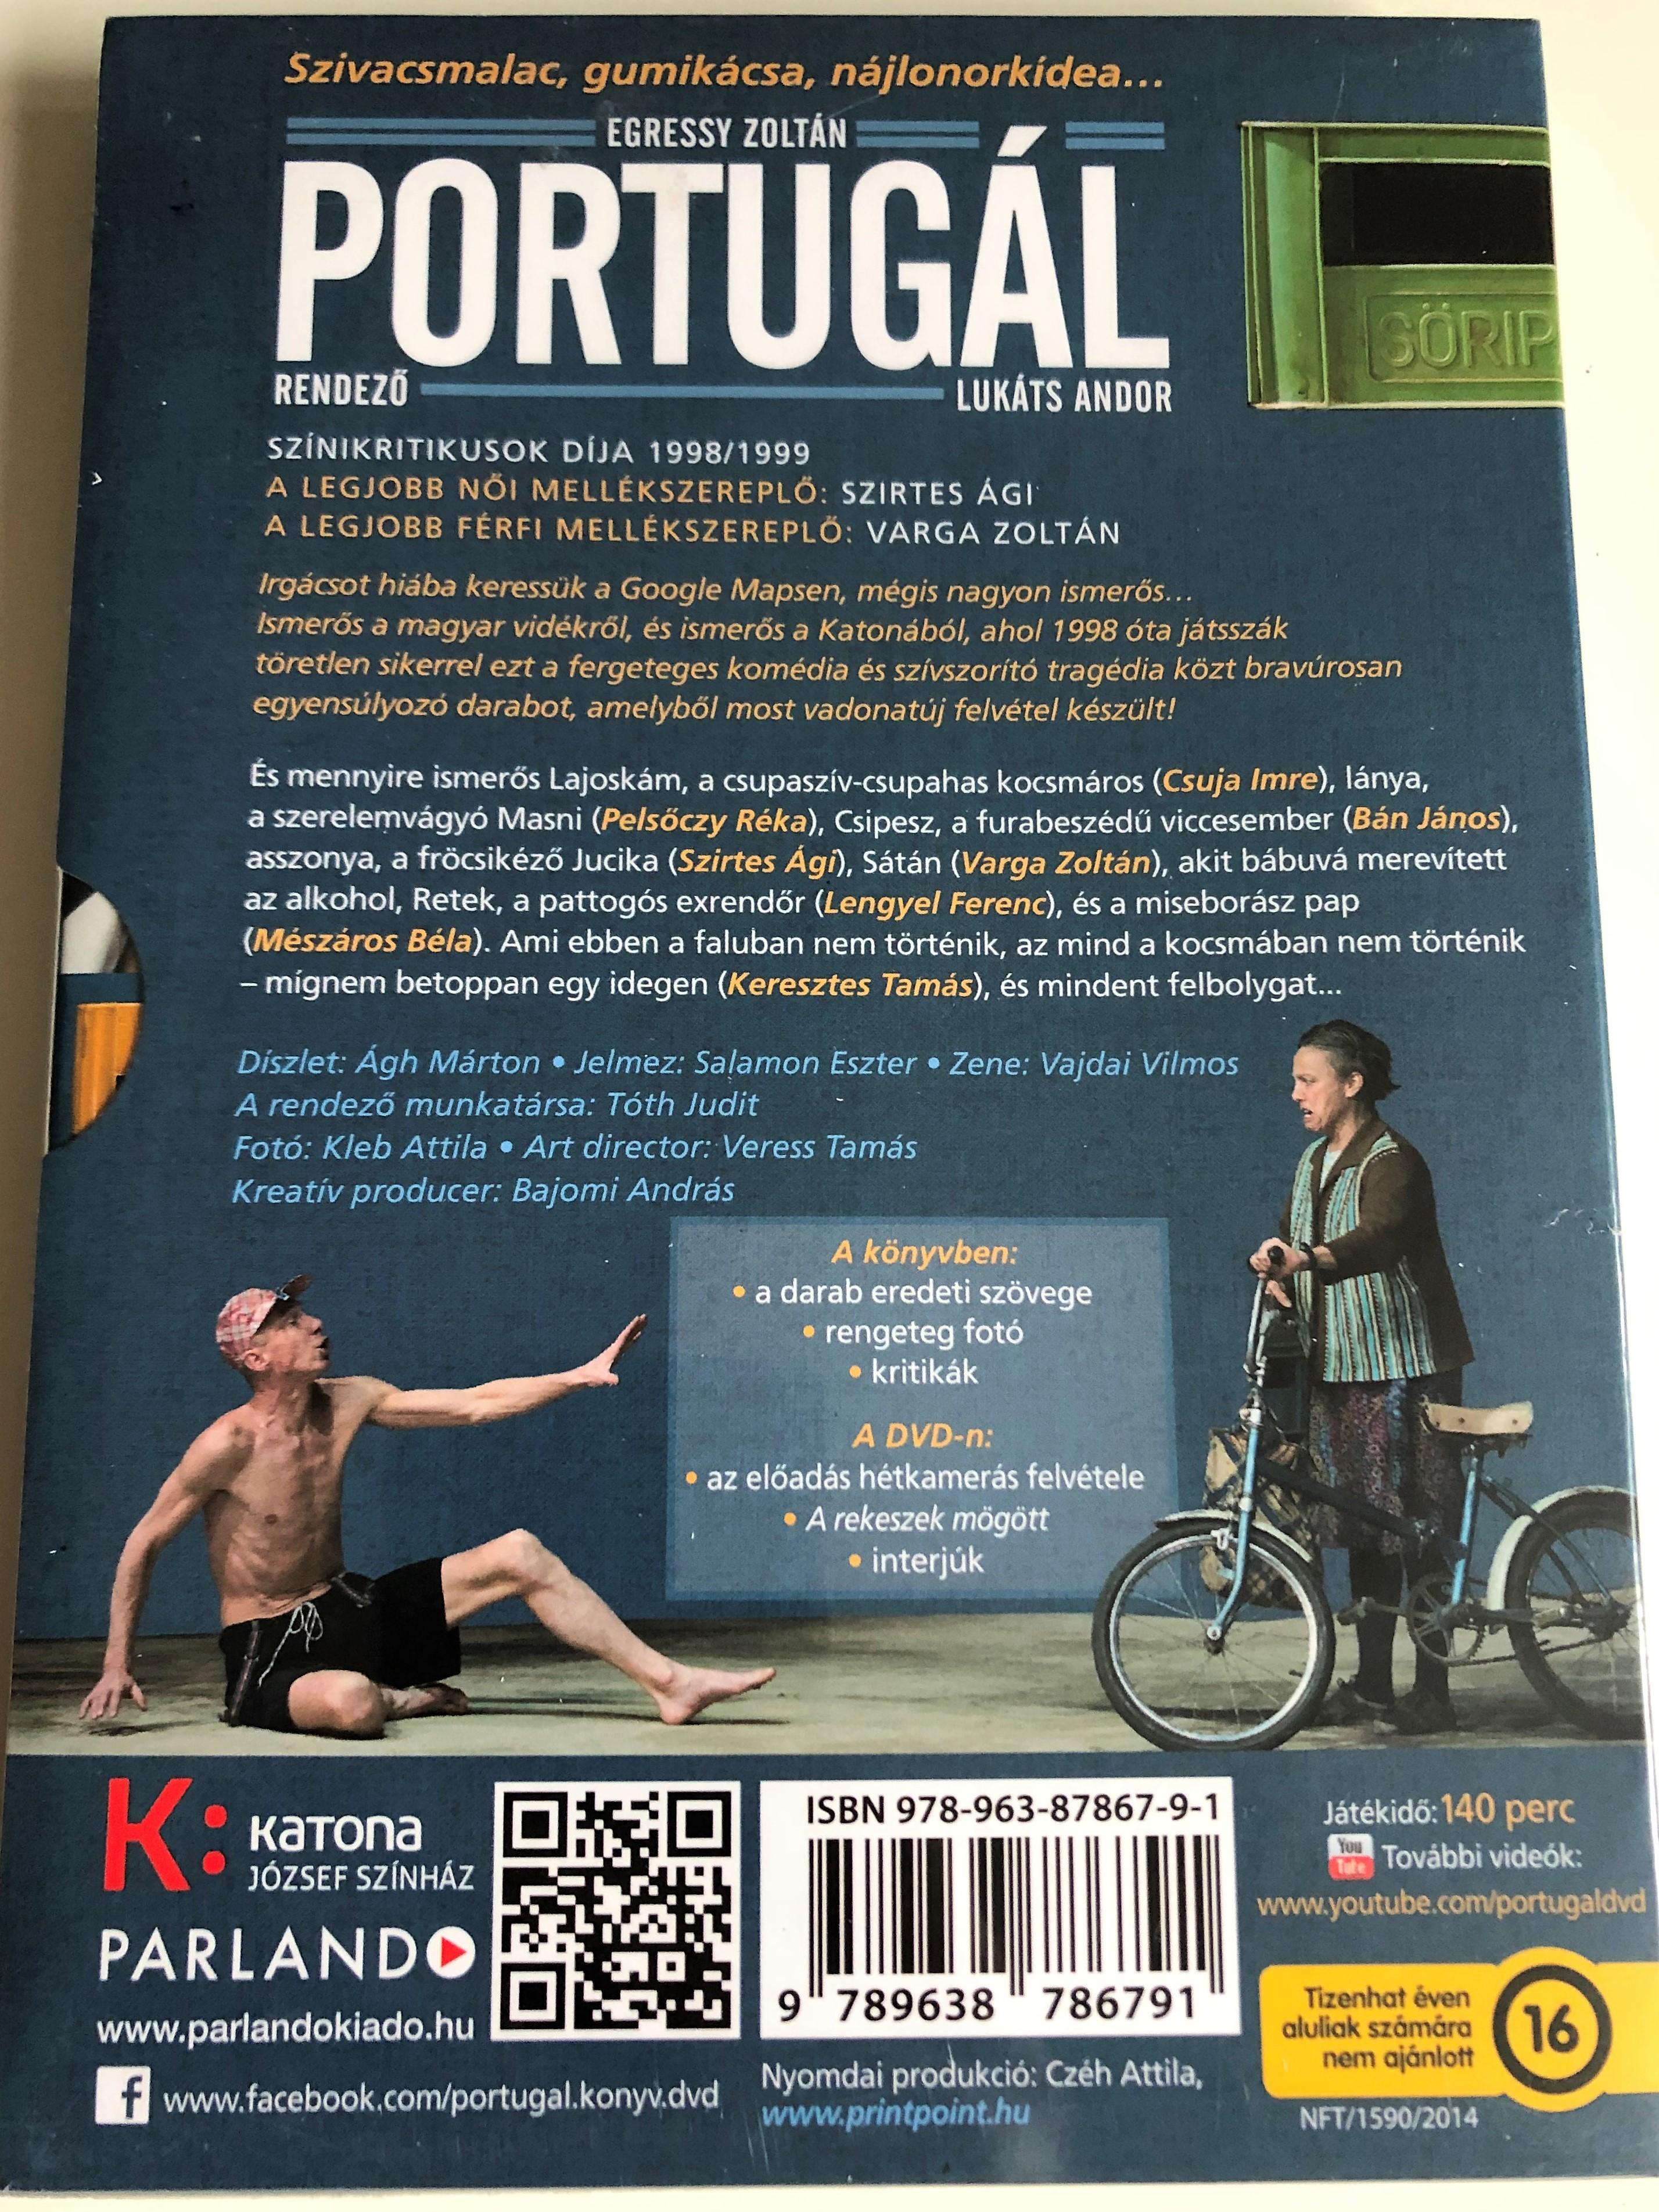 egressy-zolt-n-portug-l-dvd-2014-directed-by-luk-ts-andor-starring-csuja-imre-pels-czy-r-ka-b-n-j-nos-szirtes-gi-varga-zolt-n-lengyel-ferenc-m-sz-ros-b-la-keresztes-tam-s-theatre-play-book-and-dvd-katona-2097221-.jpg